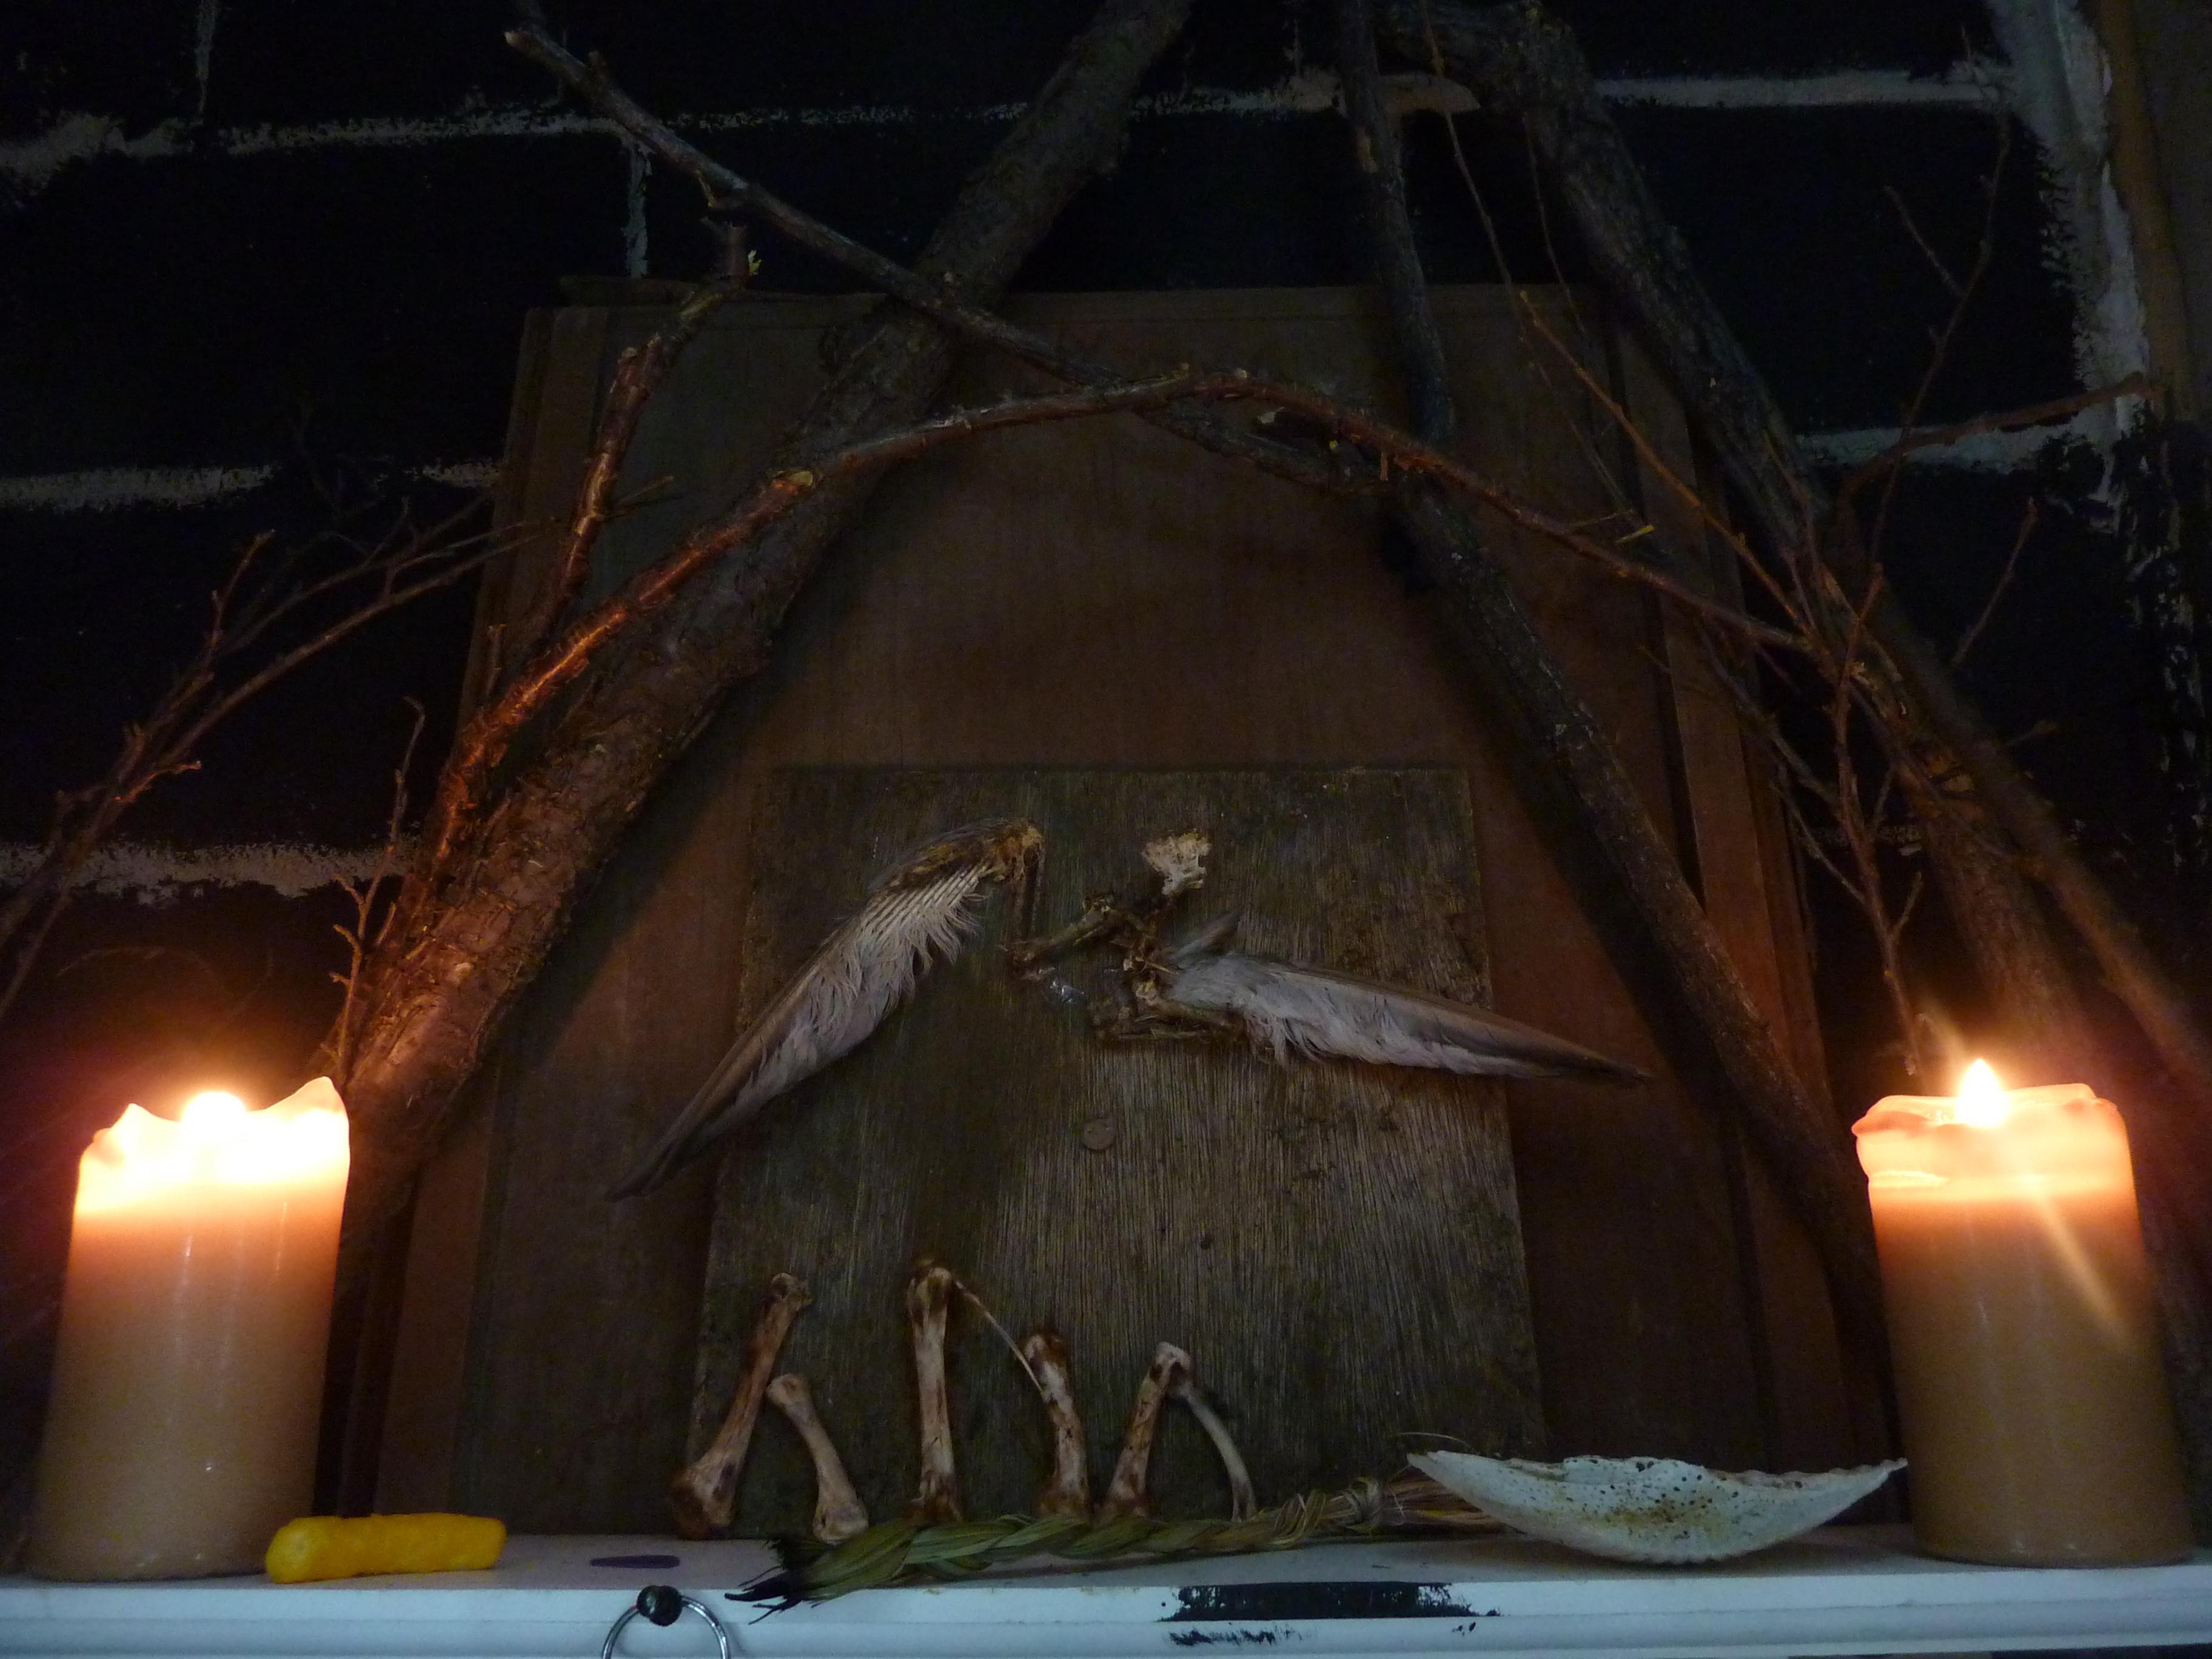 Winged Apocalypse (Jack Bride, Chris Zajko, and Jayda Karsten)